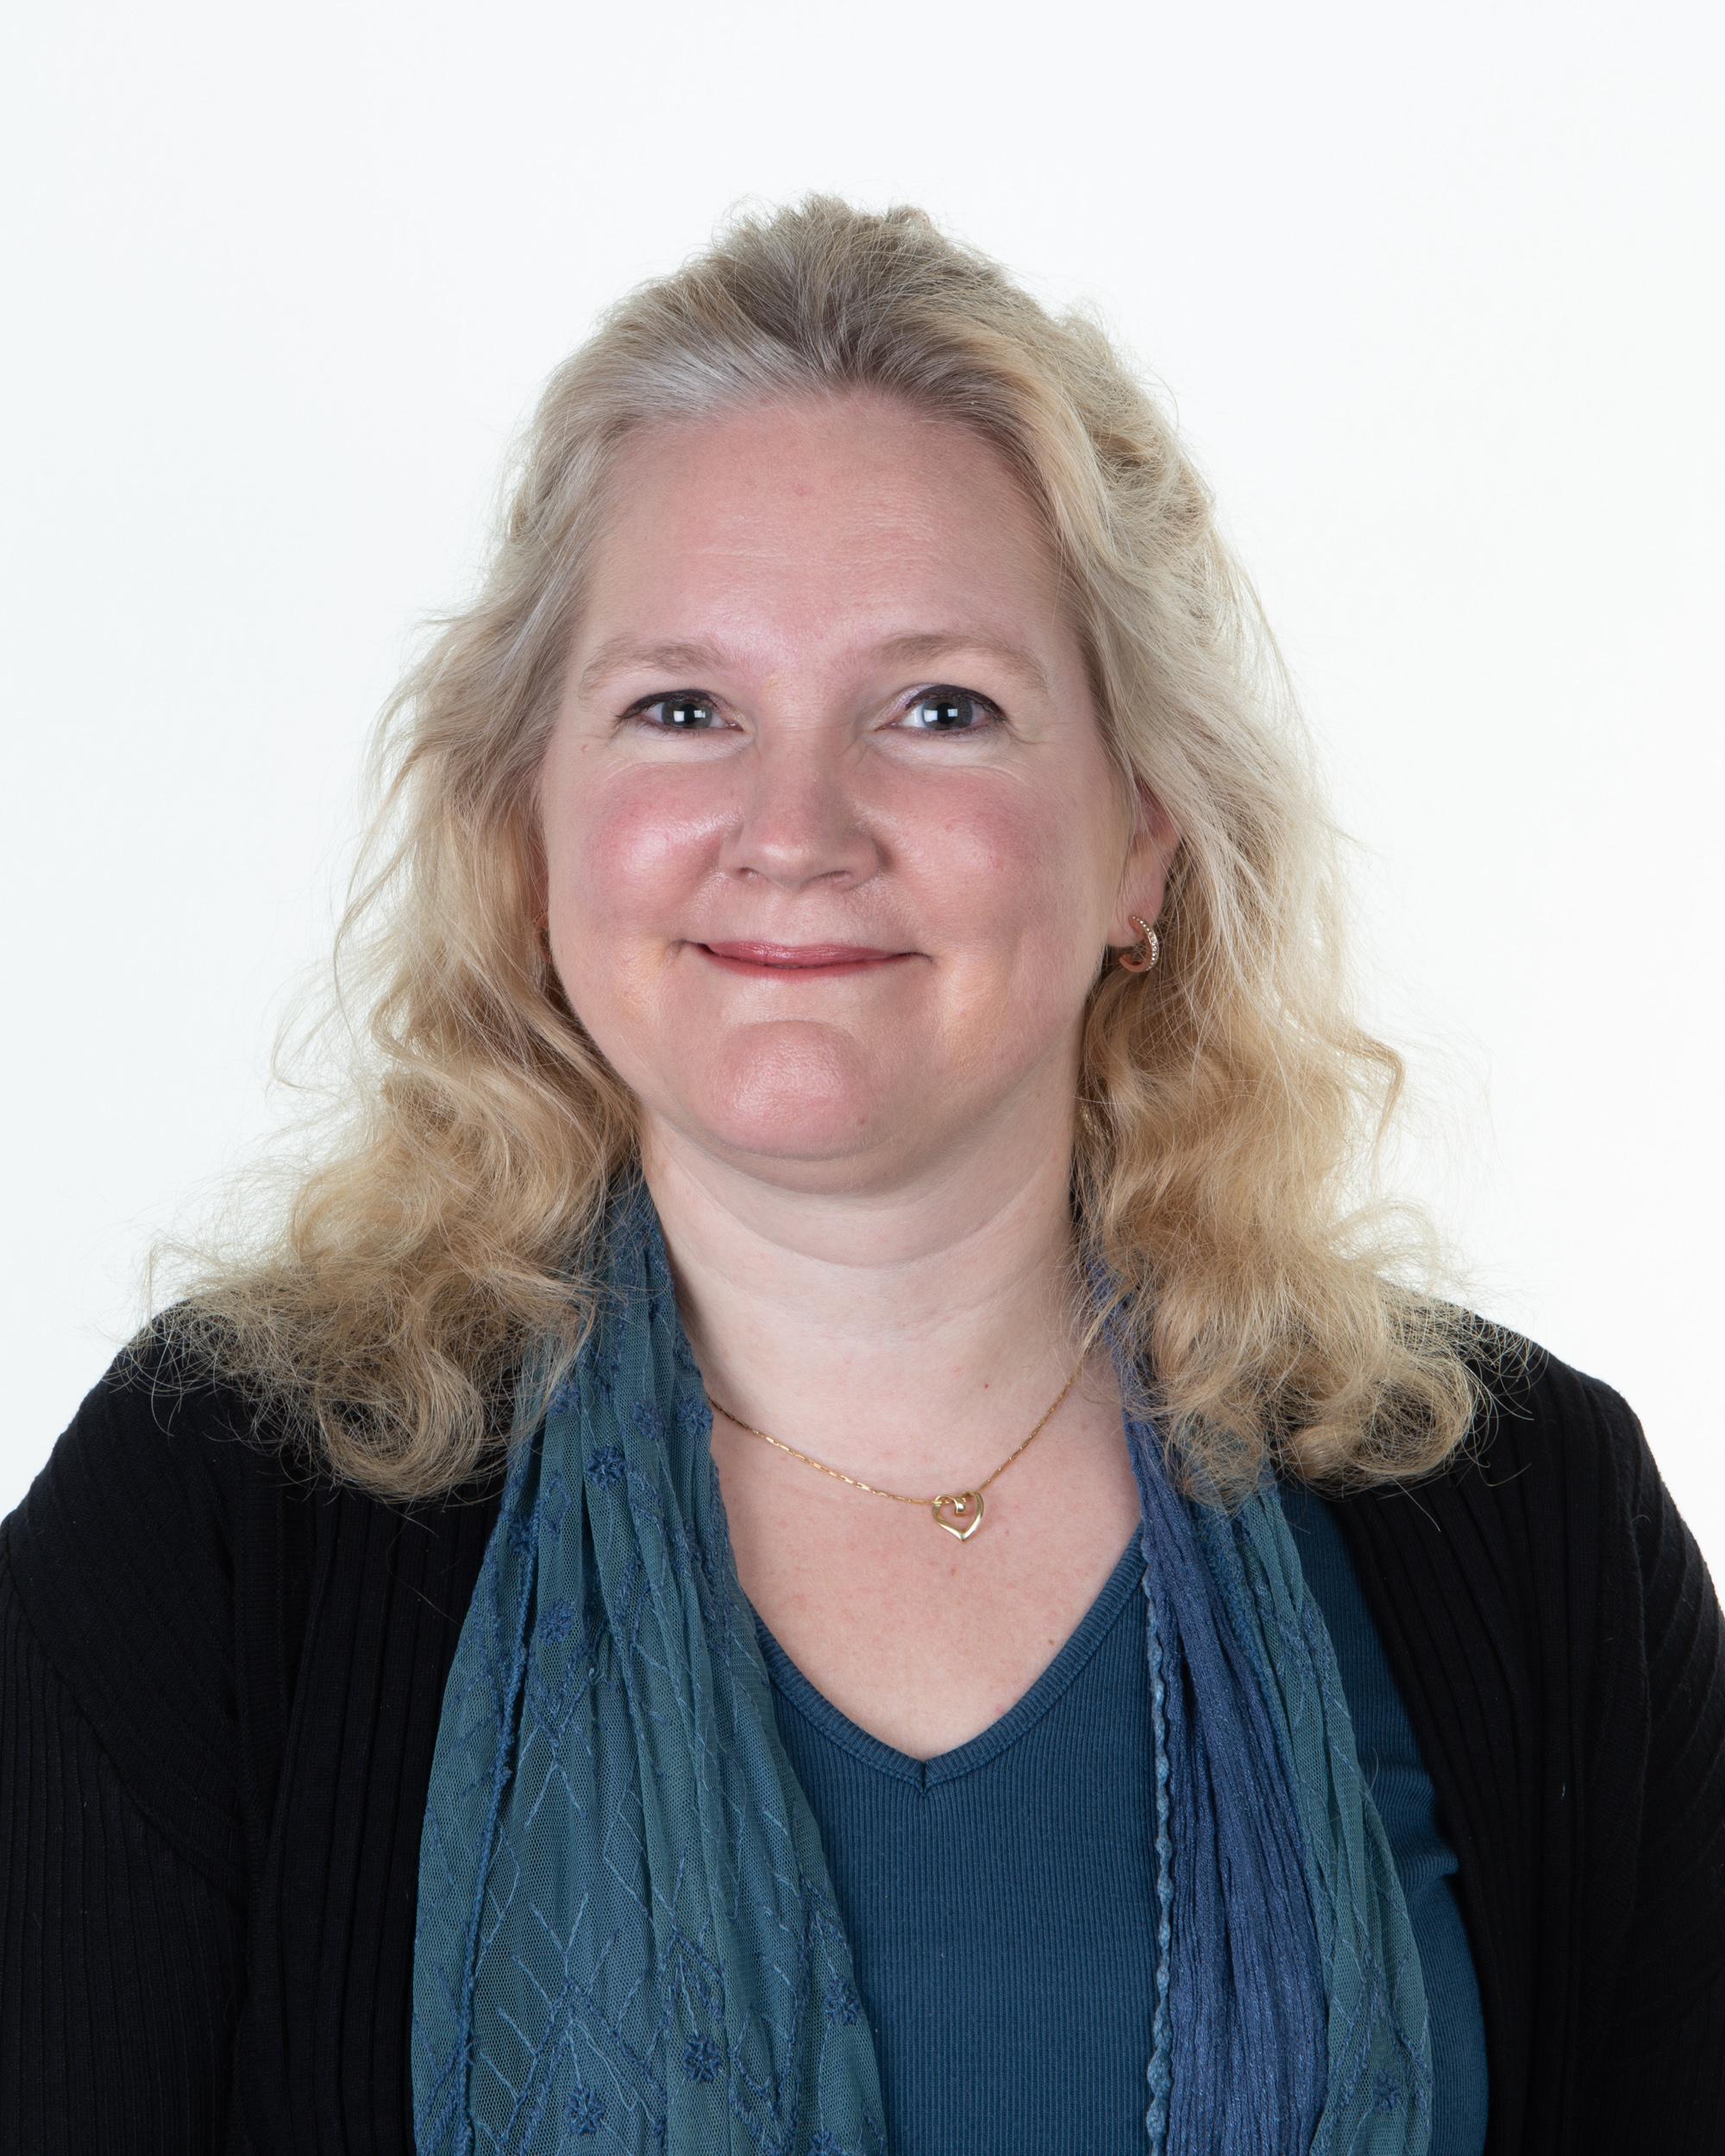 Anna Kyloff